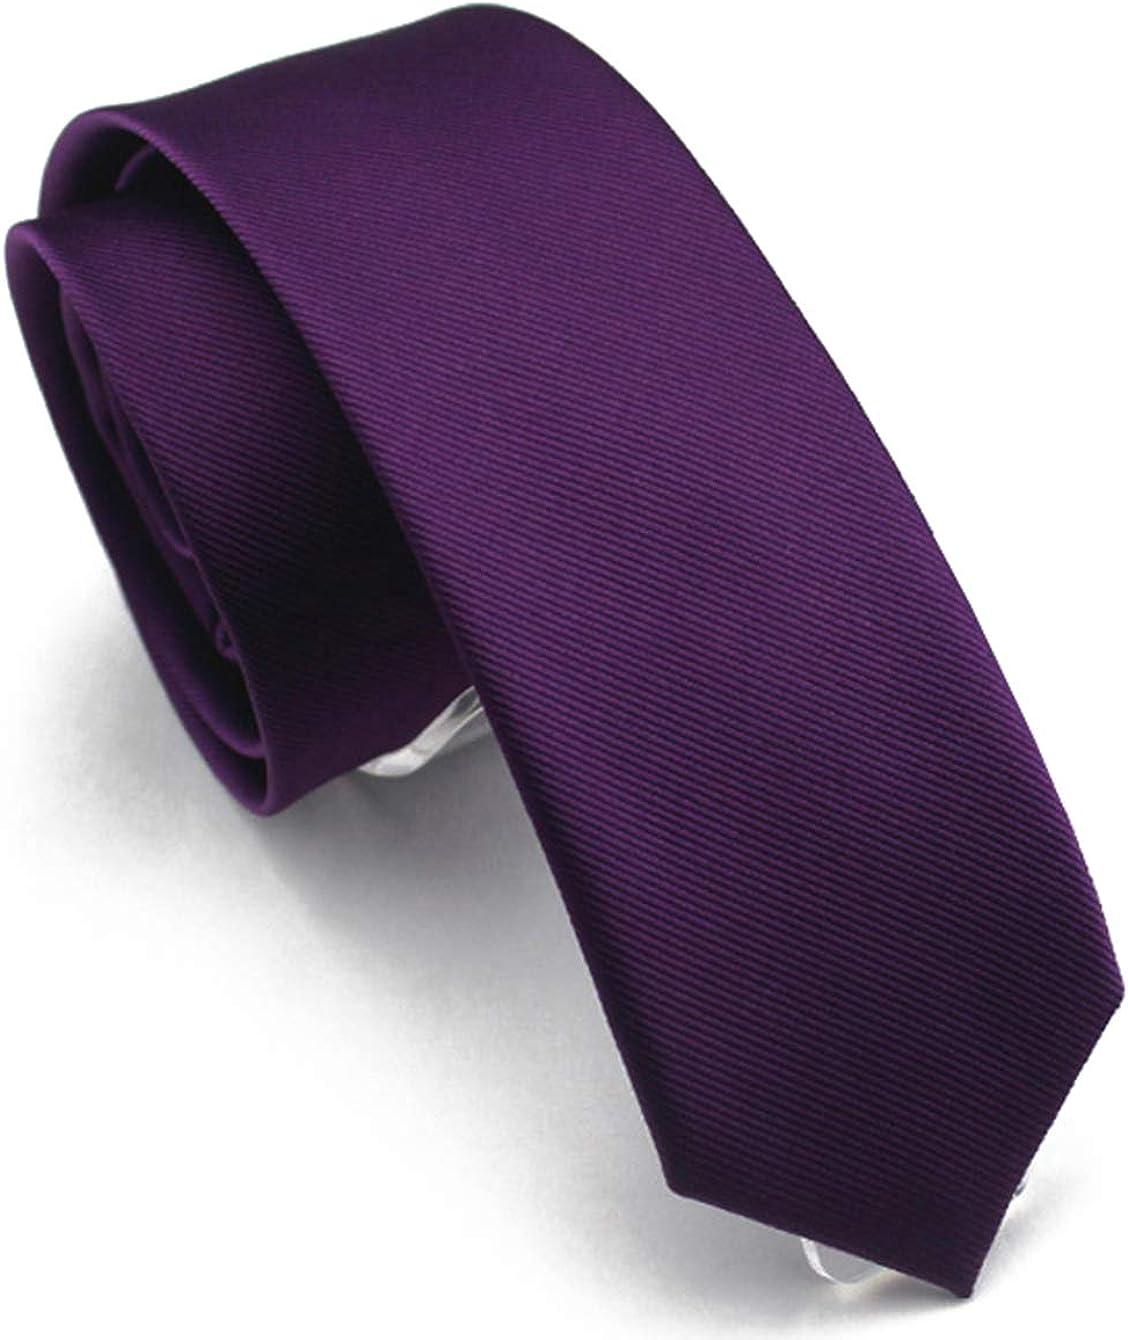 Wehug Men's Classic Solid Color Tie Slim Tie Skinny Ties For Men 2.4'' (6cm)